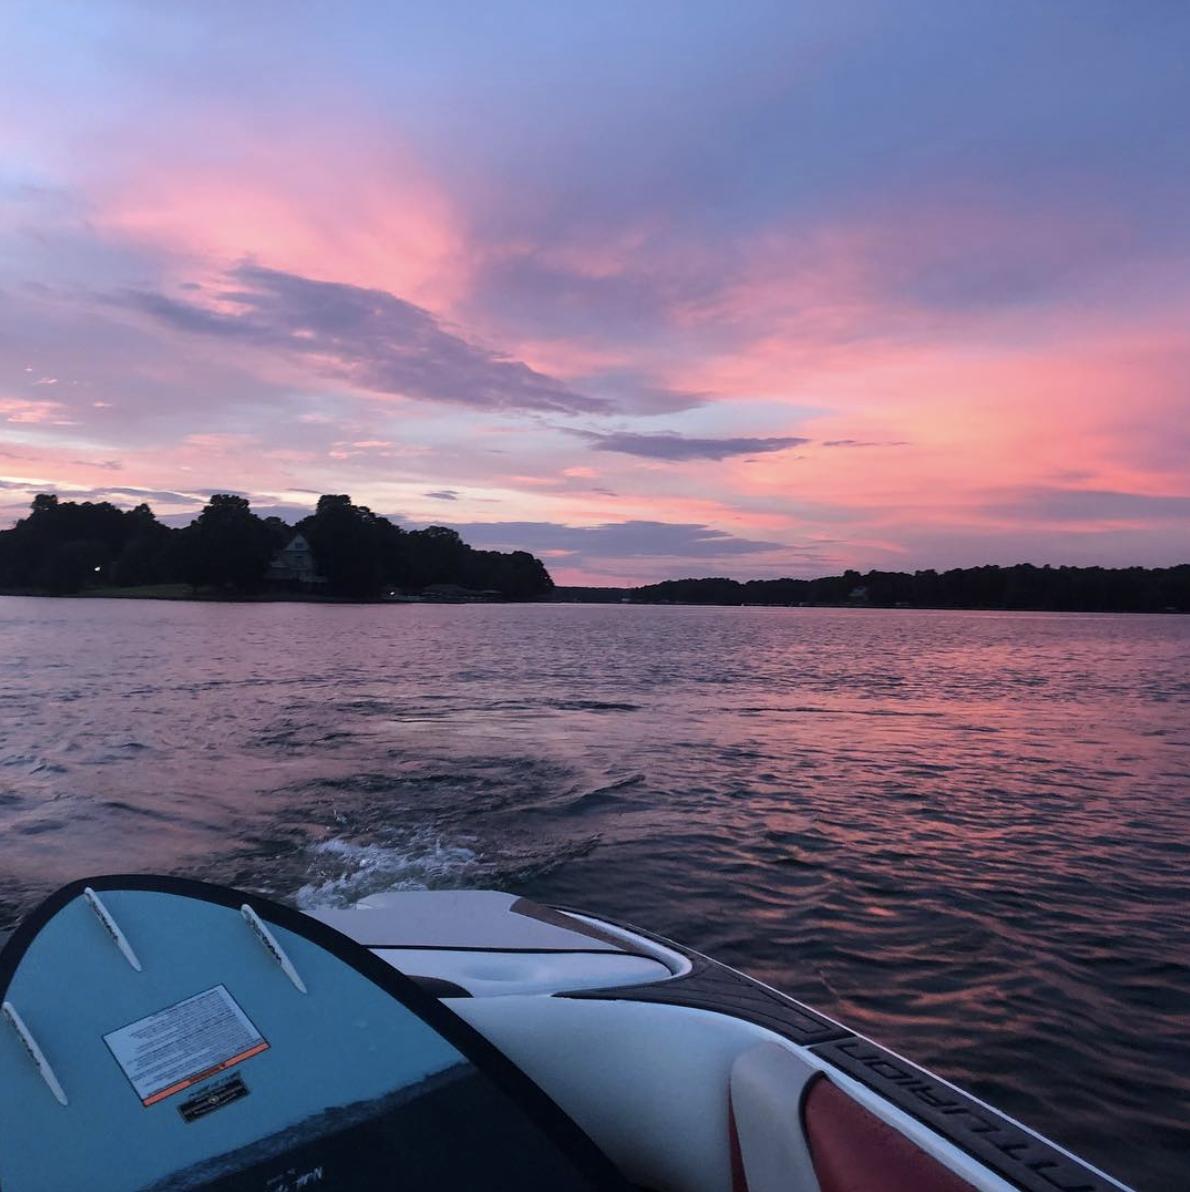 Sunset Surfing on Lake Norman